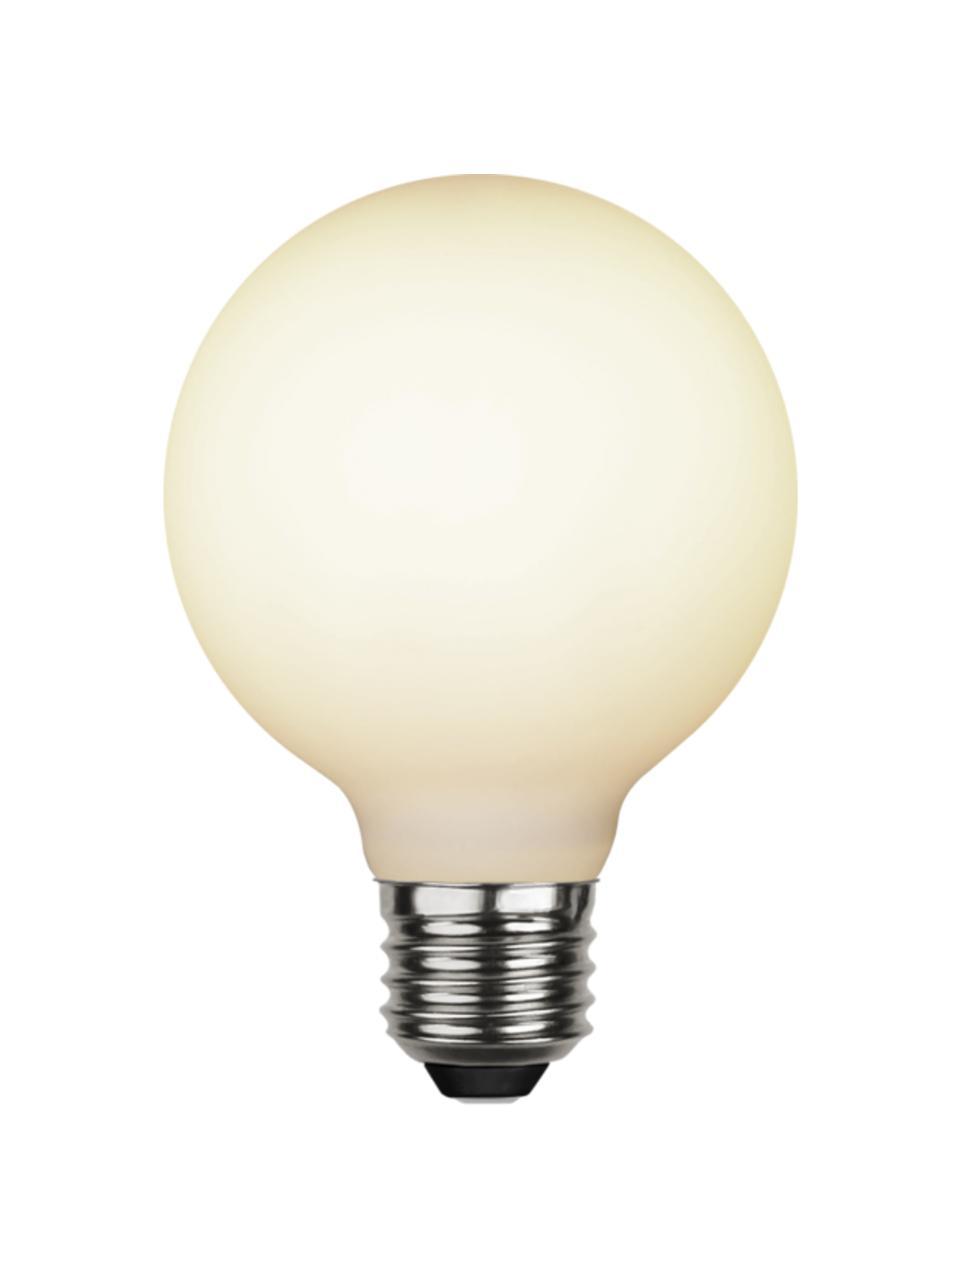 E27 Leuchtmittel, 400lm, dimmbar, warmweiß, 1 Stück, Leuchtmittelschirm: Glas, Leuchtmittelfassung: Aluminium, Weiß, Ø 8 x H 12 cm